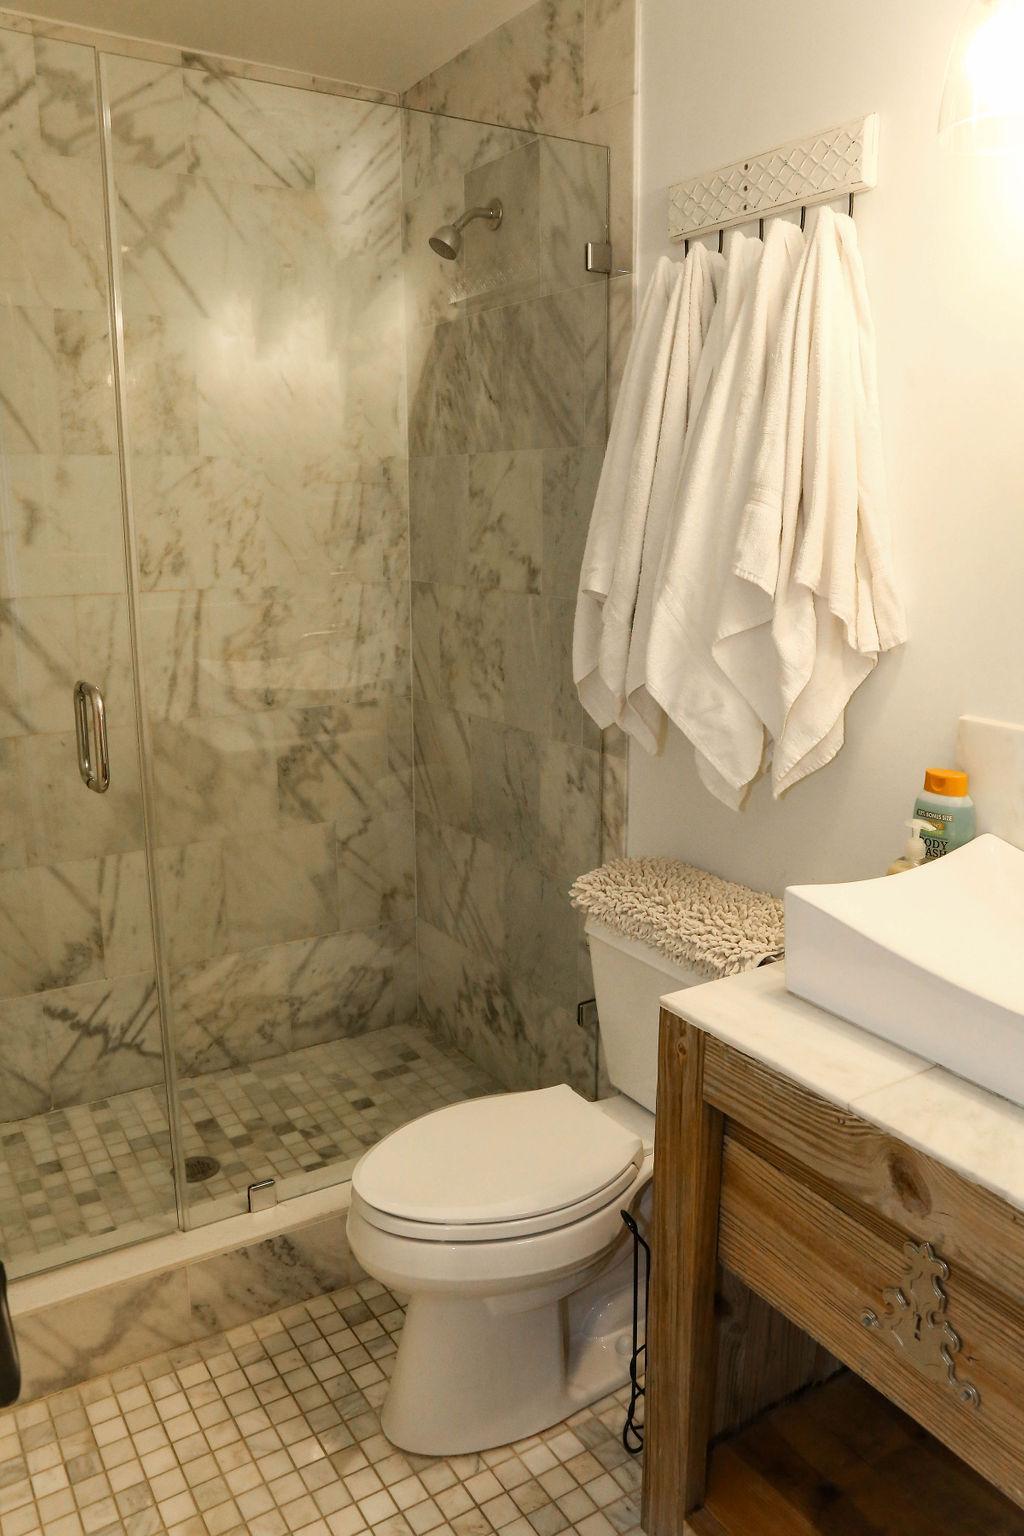 br #4 bath, marble shower with glass door